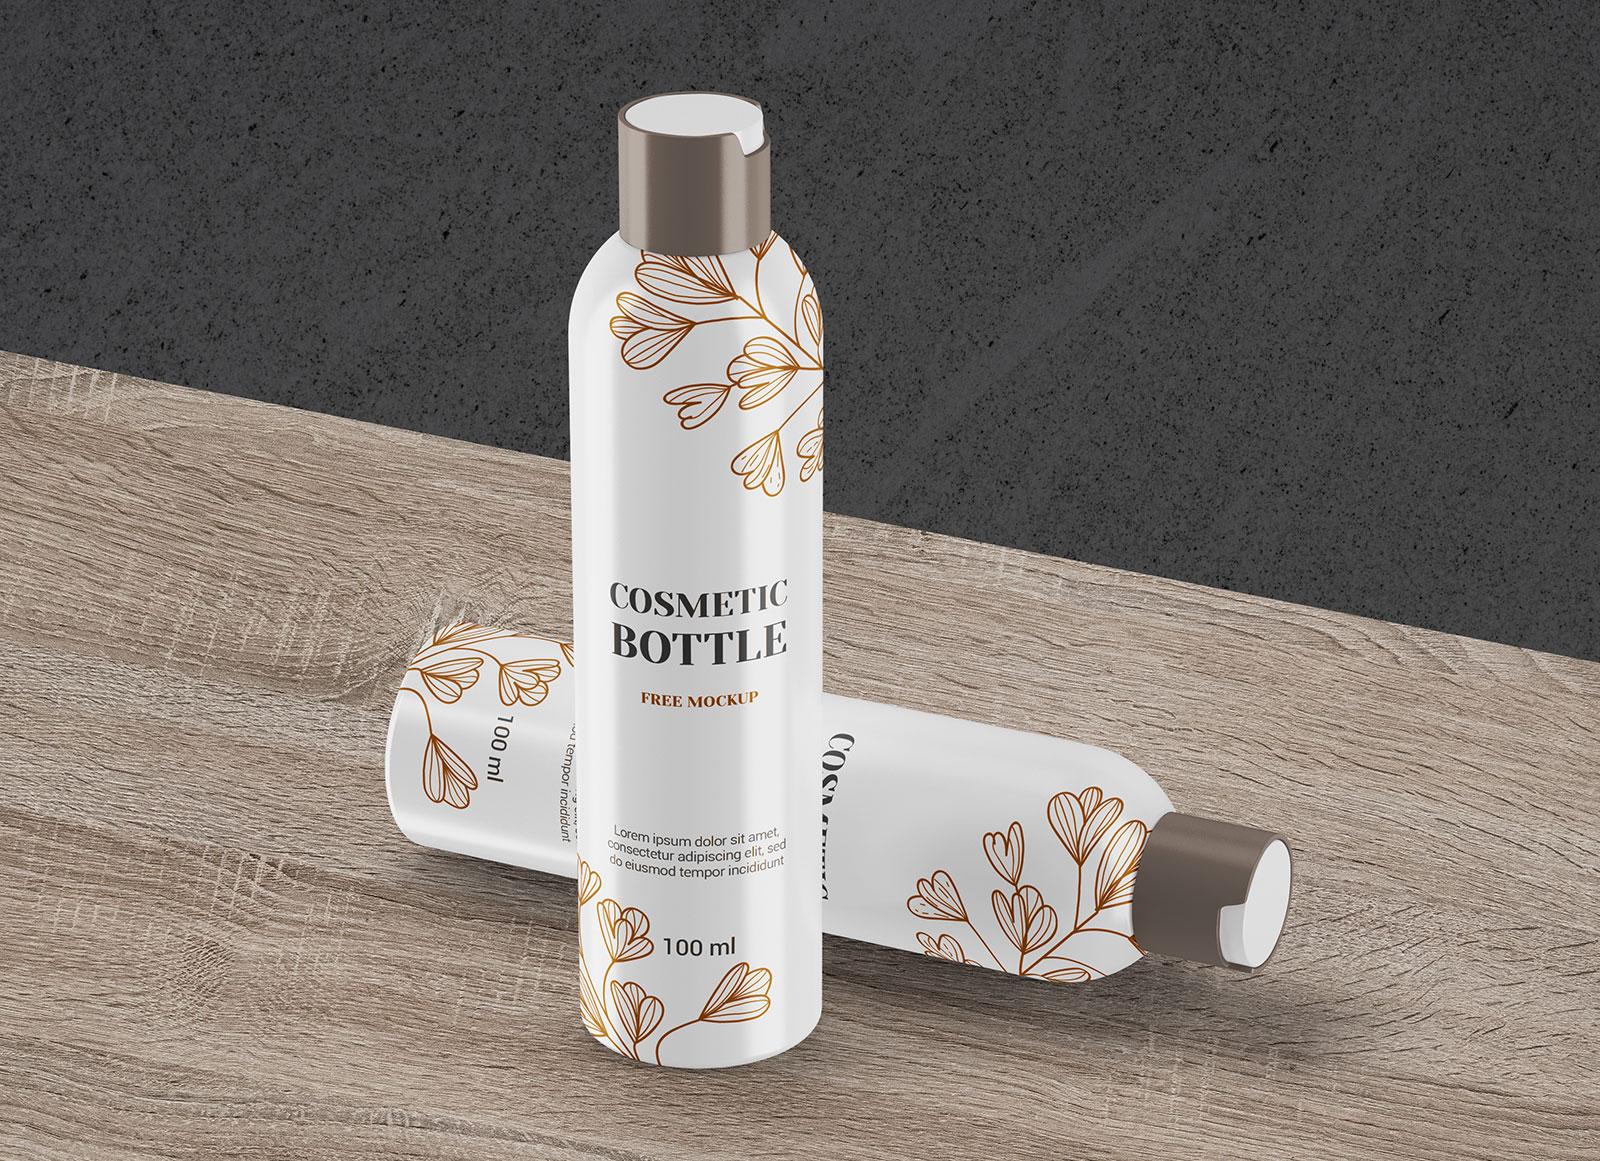 Free Perfume Deodorant Spray Bottle Mockup PSD Set (1)